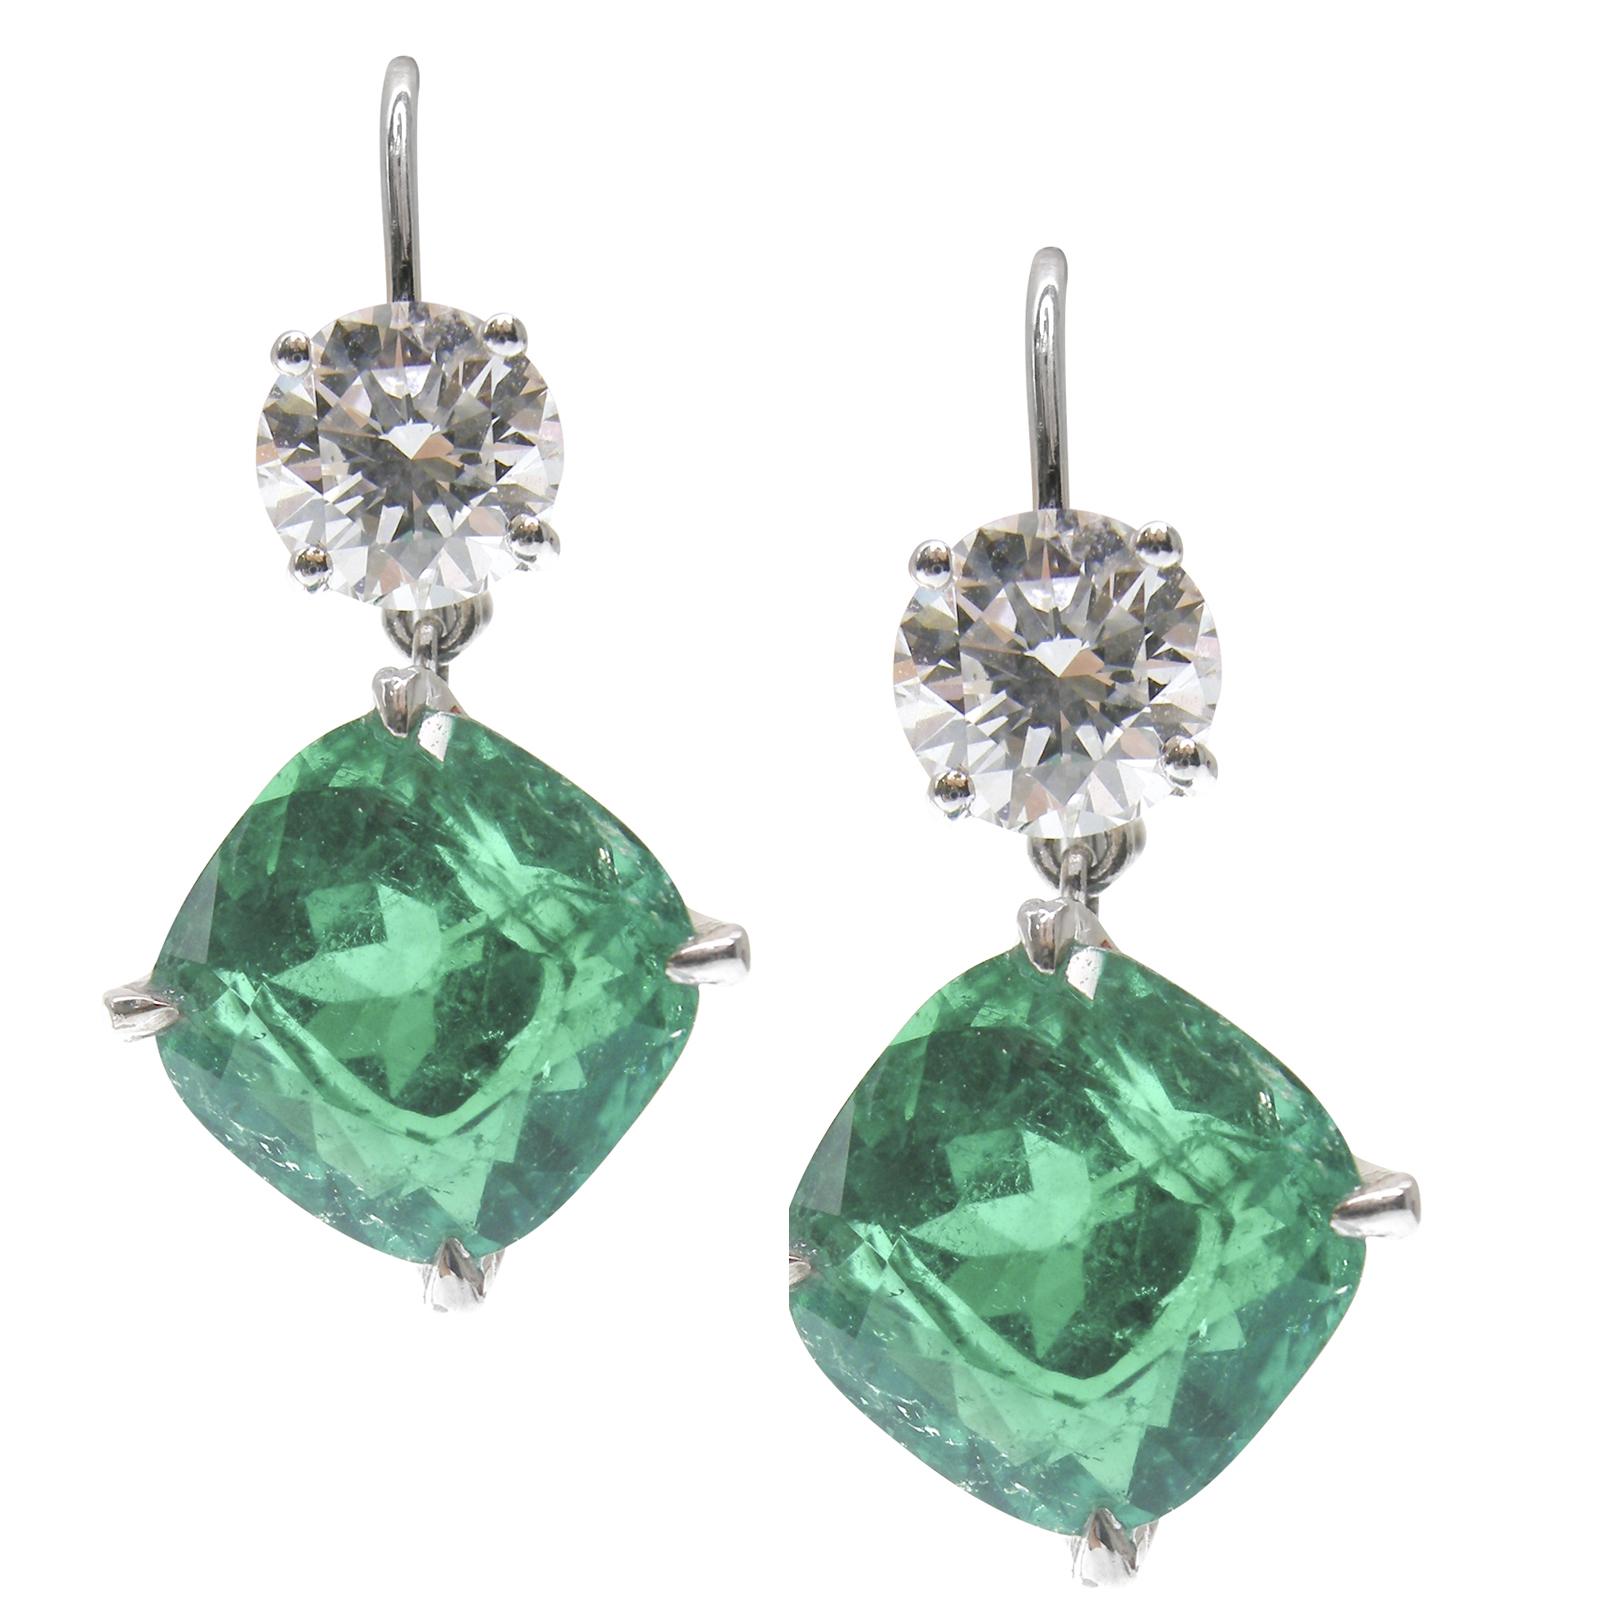 EMERALD & DIAMOND DROP EARRINGS CLUSTER DIAMOND PENDANT BESPOKE FINE JEWELLERY BY SHAHINA HATTA